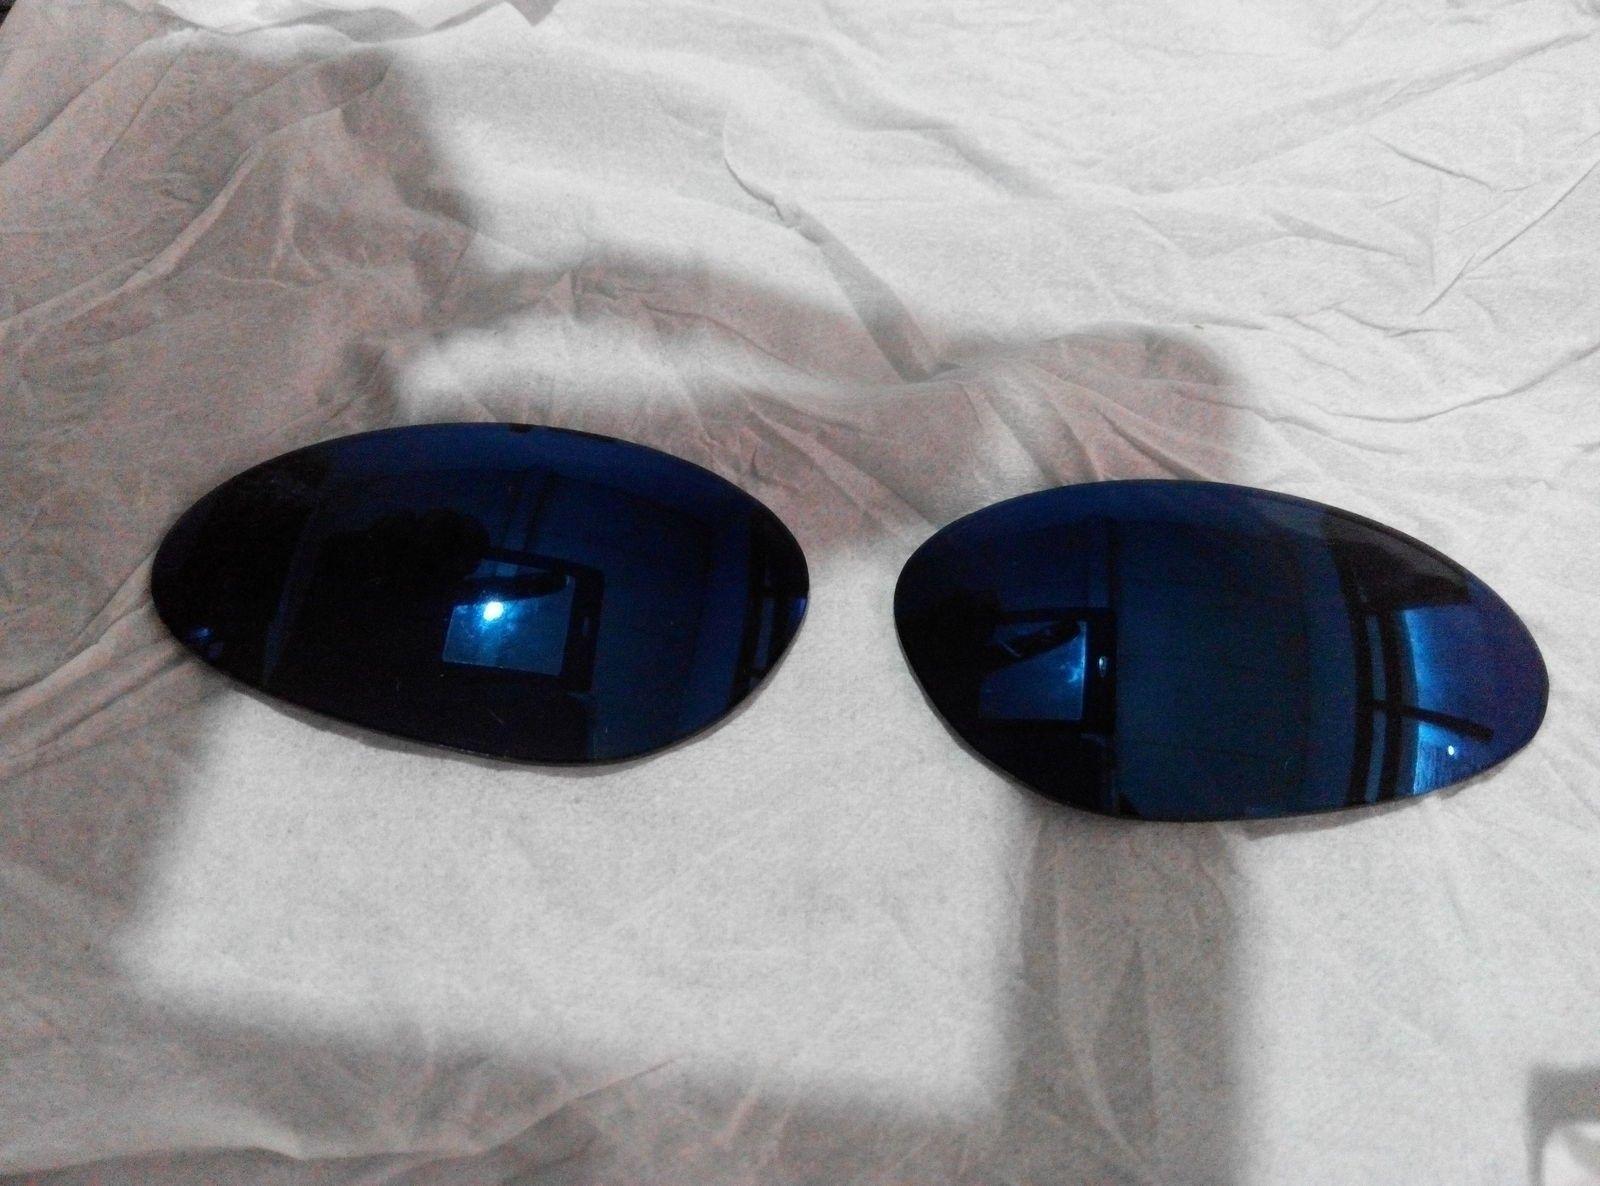 Ice iridium replacement lens for penny - IMG_20141212_152435.jpg